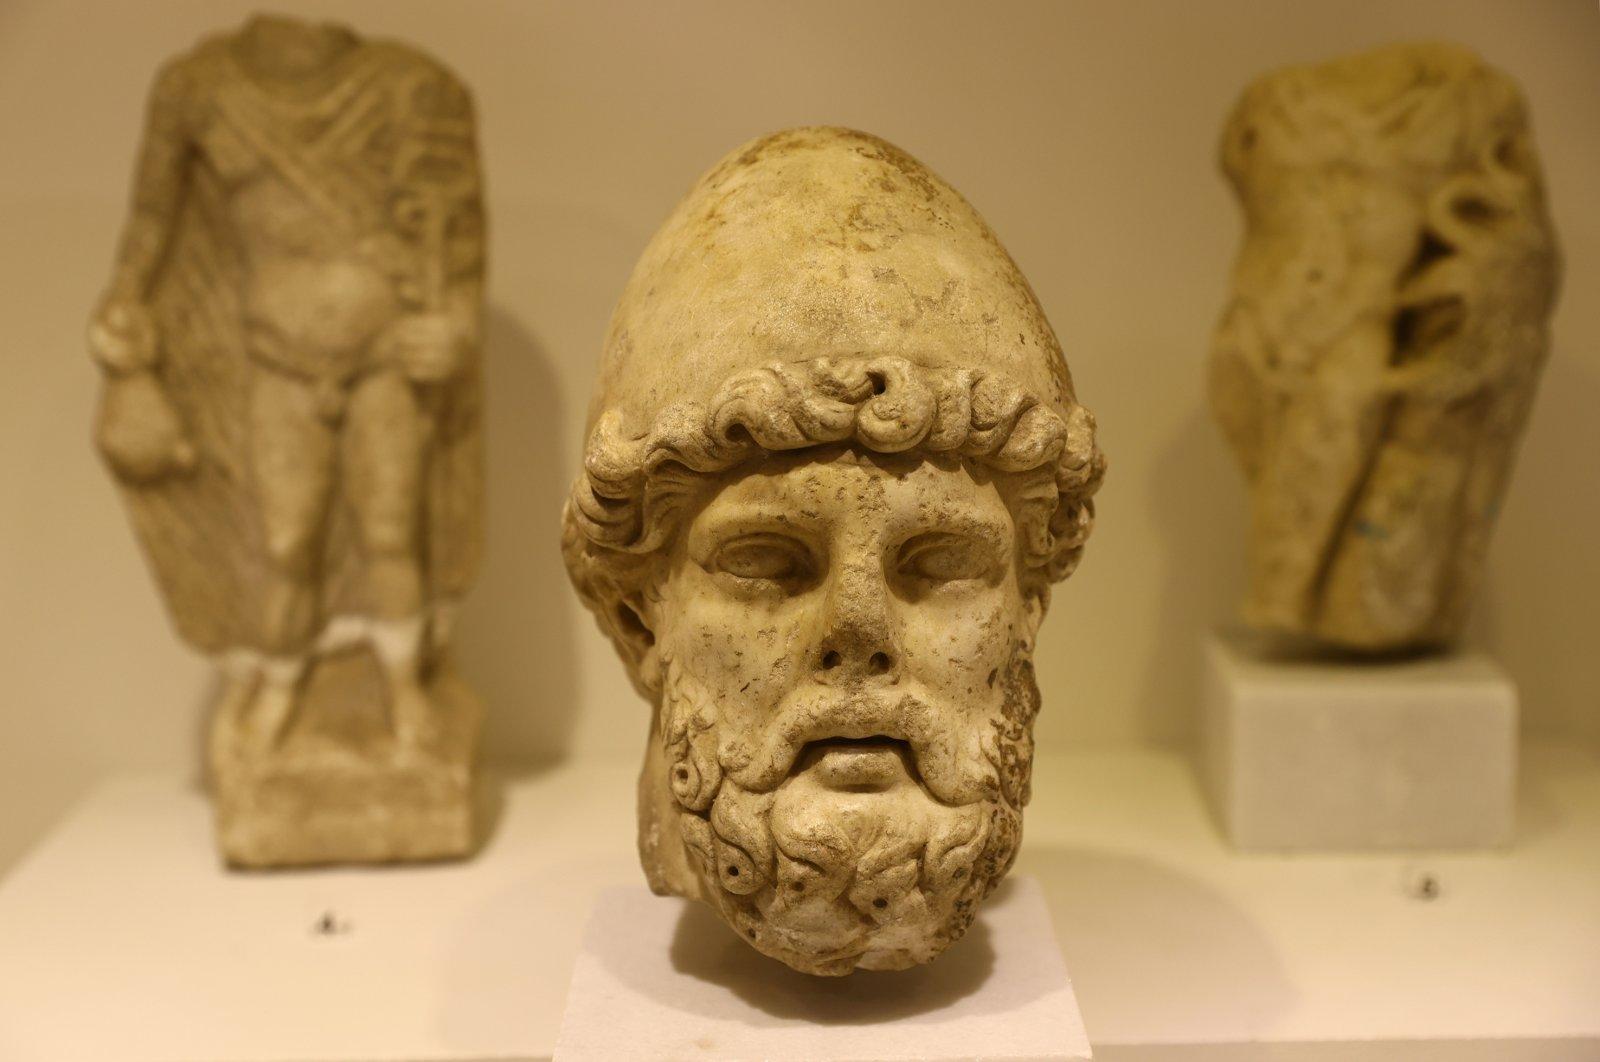 Sculptures belonging to ancient era civilizations of Thrace, Edirne, Turkey, April 9, 2021. (AA Photo)